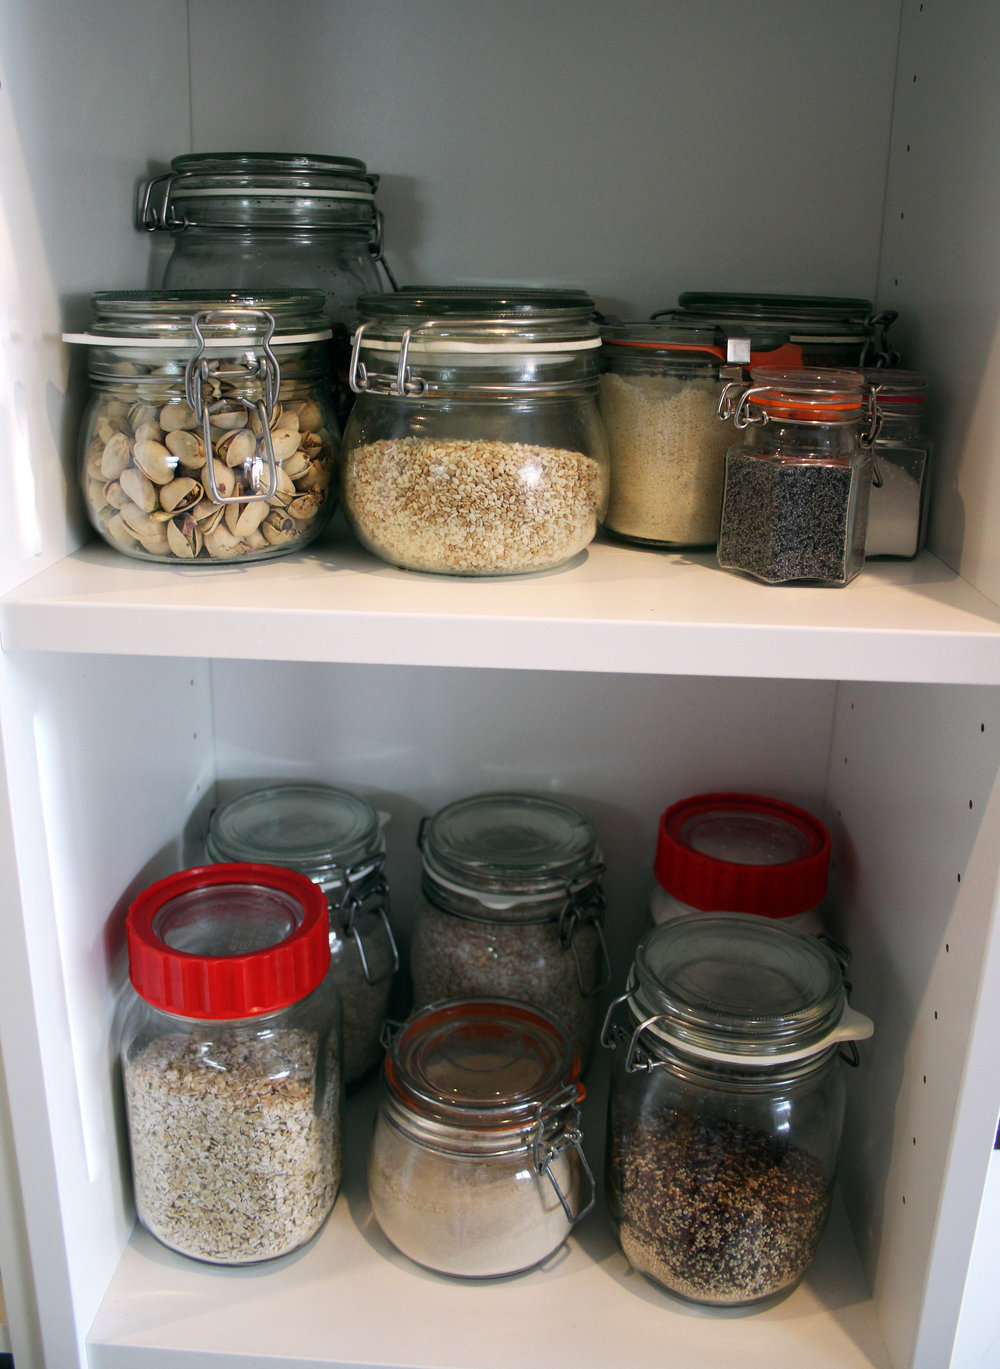 Kilner jars kitchen | The Flourishing Pantry